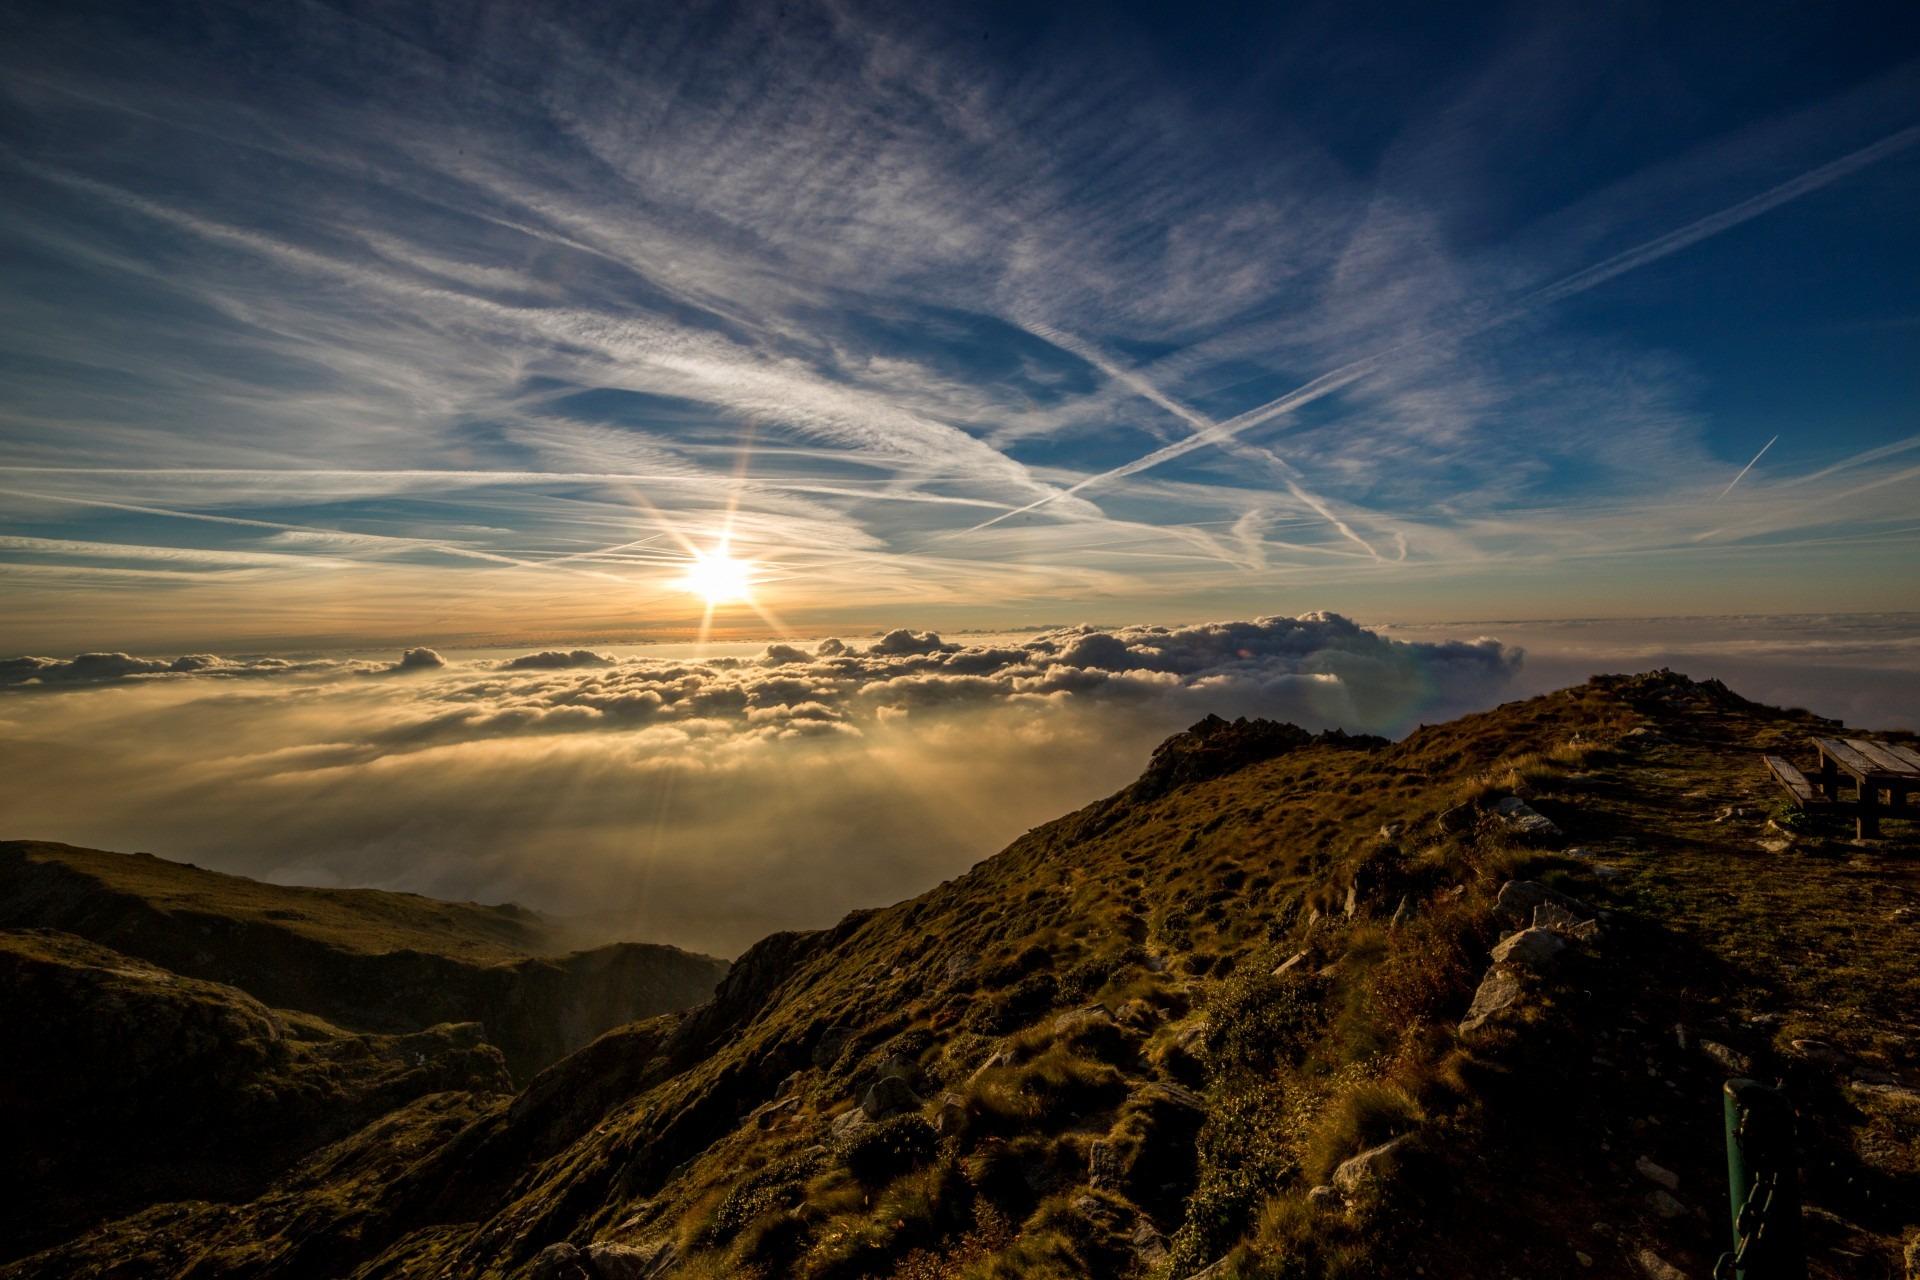 Sun Mountains Dusk Dawn Laptop Full HD 1080P HD 4k